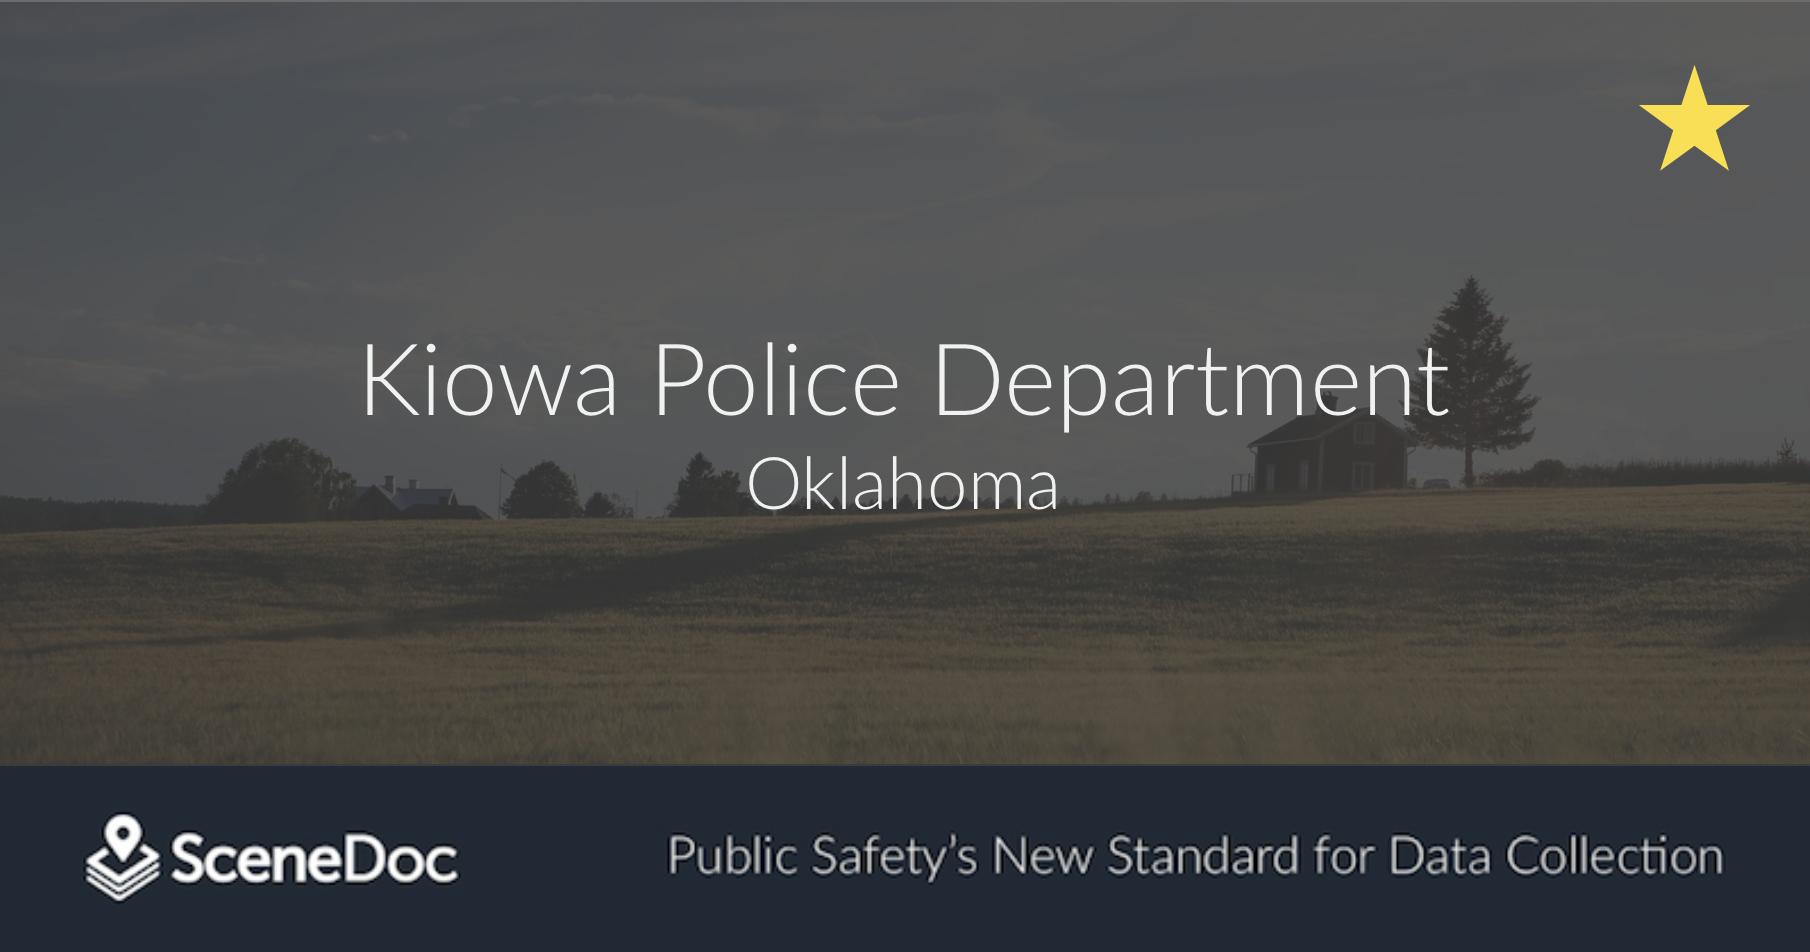 Kiowa Police Department Innovates with SceneDoc eCitations